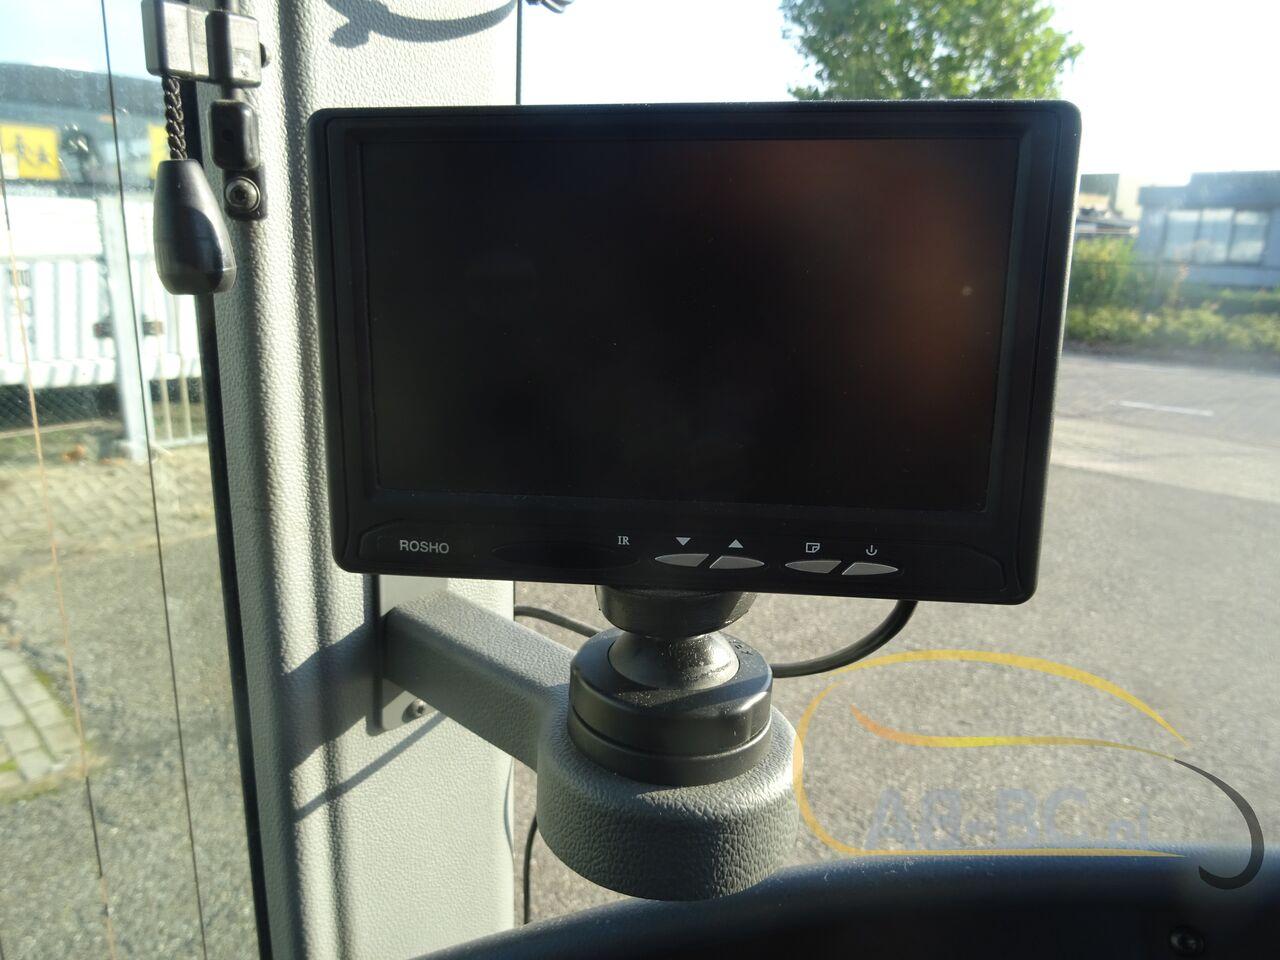 coach-bus-SETRA-S415H-52-Seats-EURO-6-Liftbus---1630913326091607642_big_a14acbd49dfb6a8a3bd74b64197fdcdd--21070517141280735500